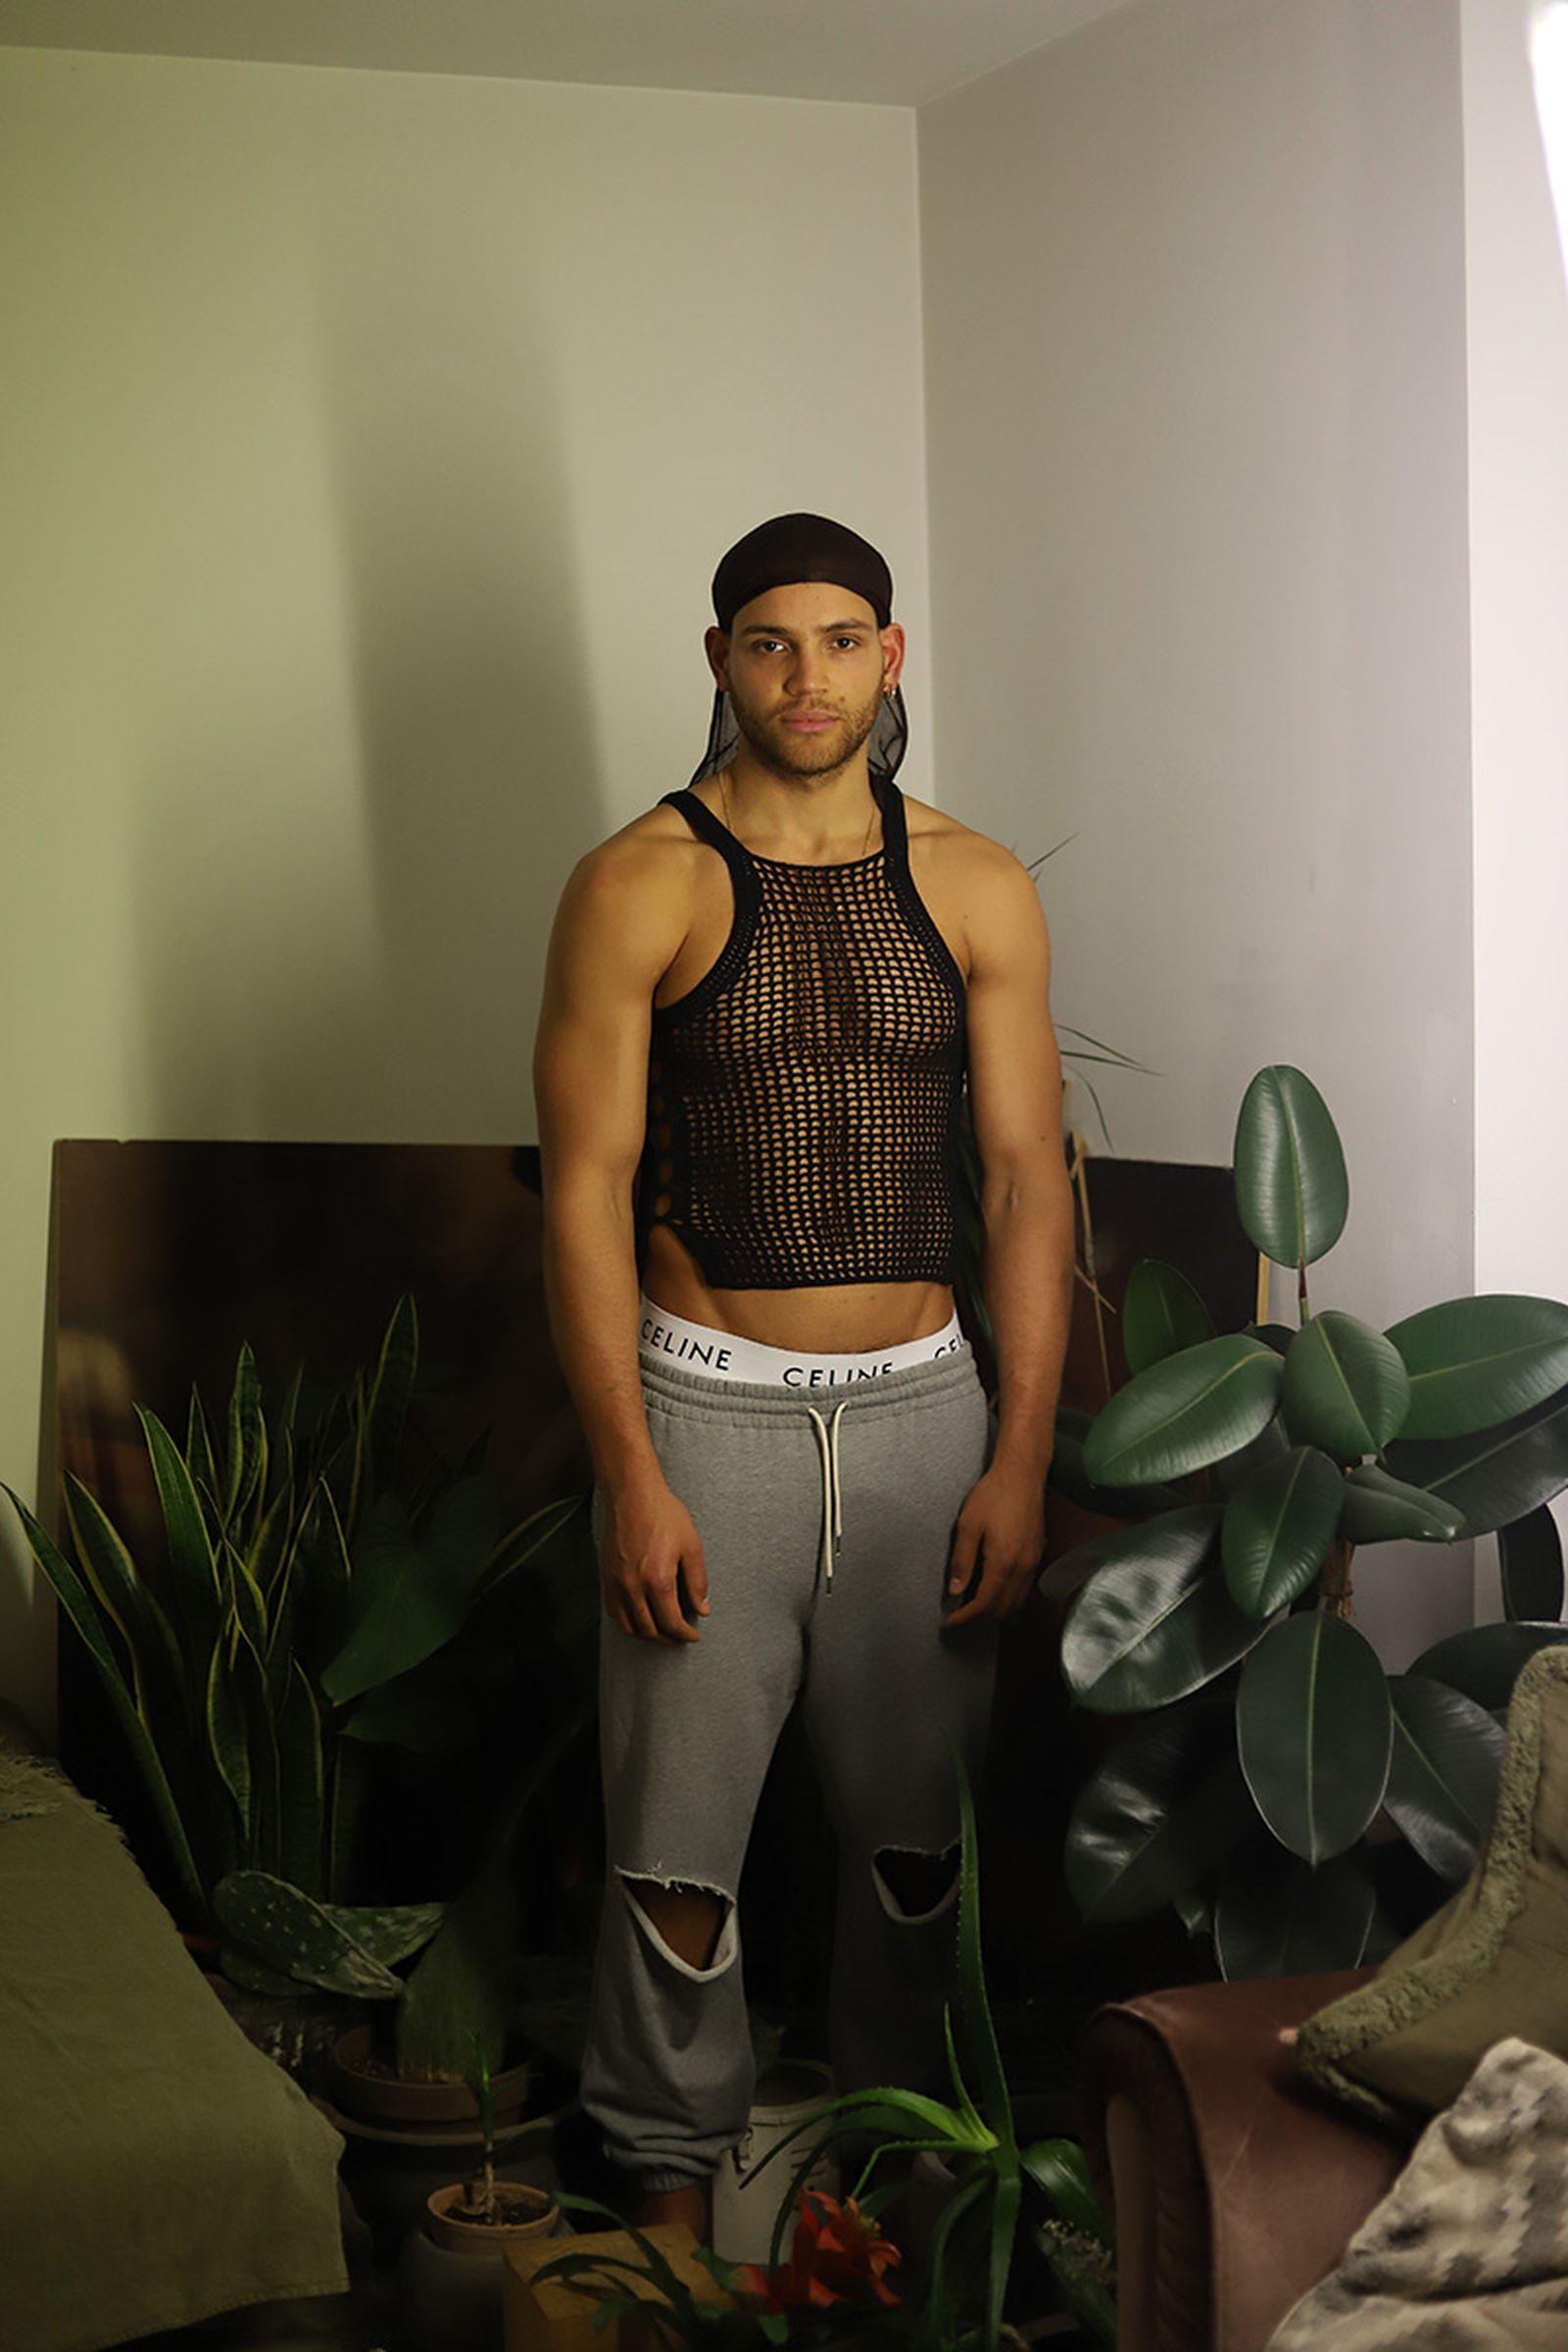 mesh tank top DION LEE  grey loose cotton trackpants & white cotton underwear CELINE durag personal